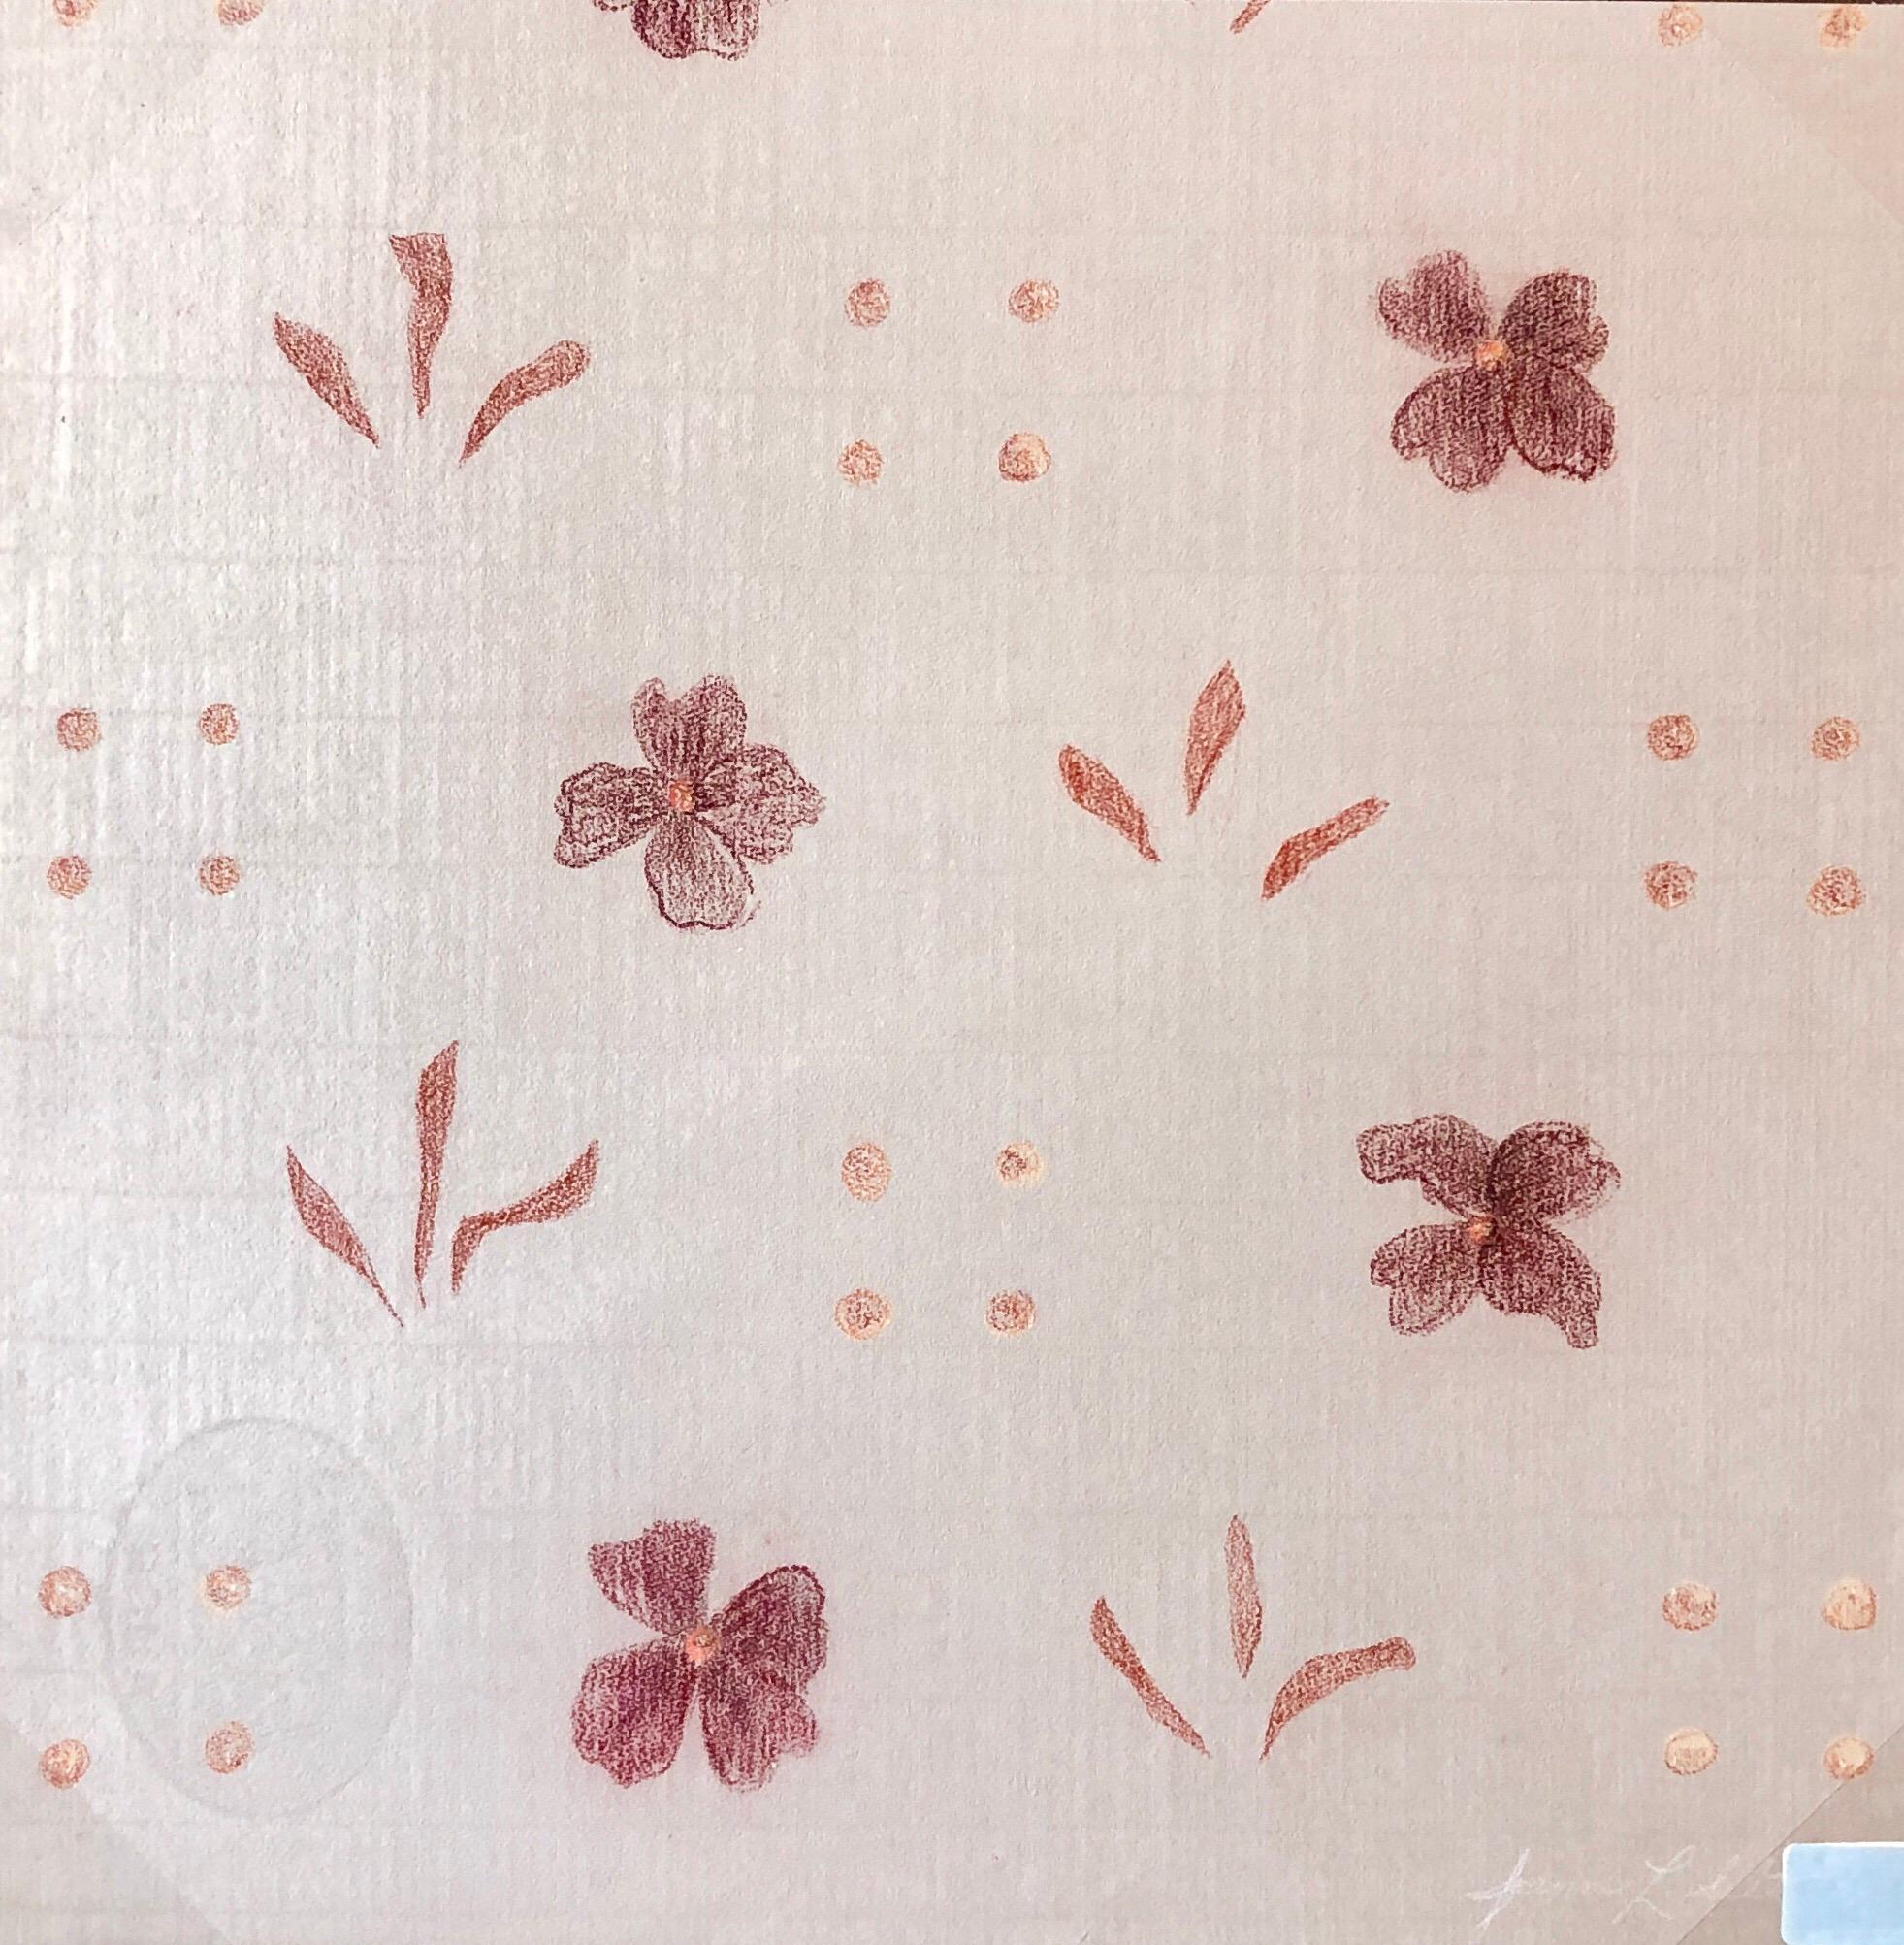 Original Pastel Drawing Flowers, Wallpaper Pattern and Decoration Pop Art